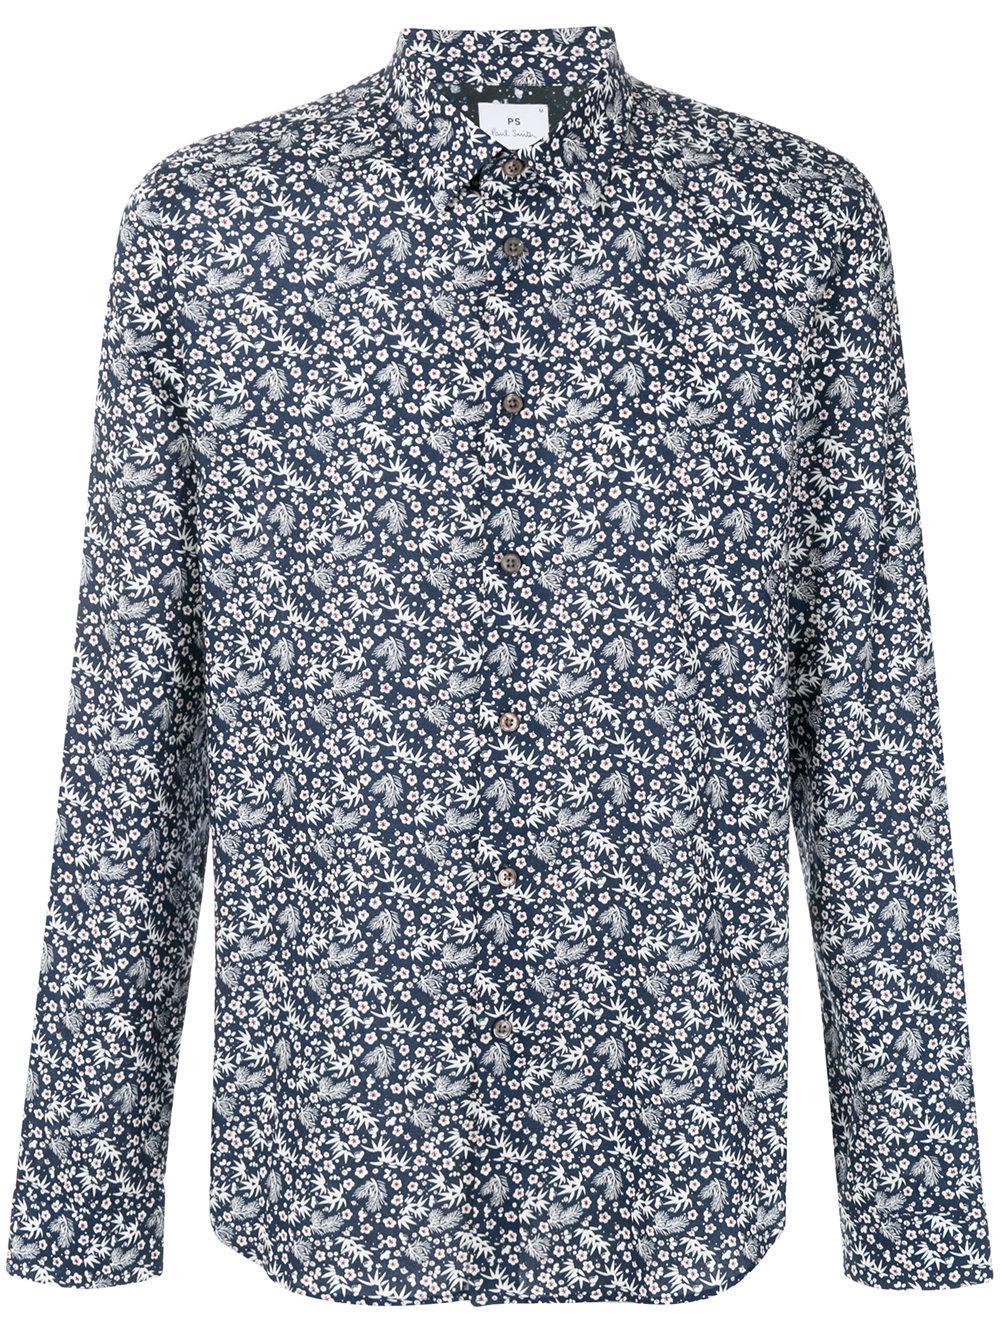 Paul Smith Floral Foliage Print Shirt